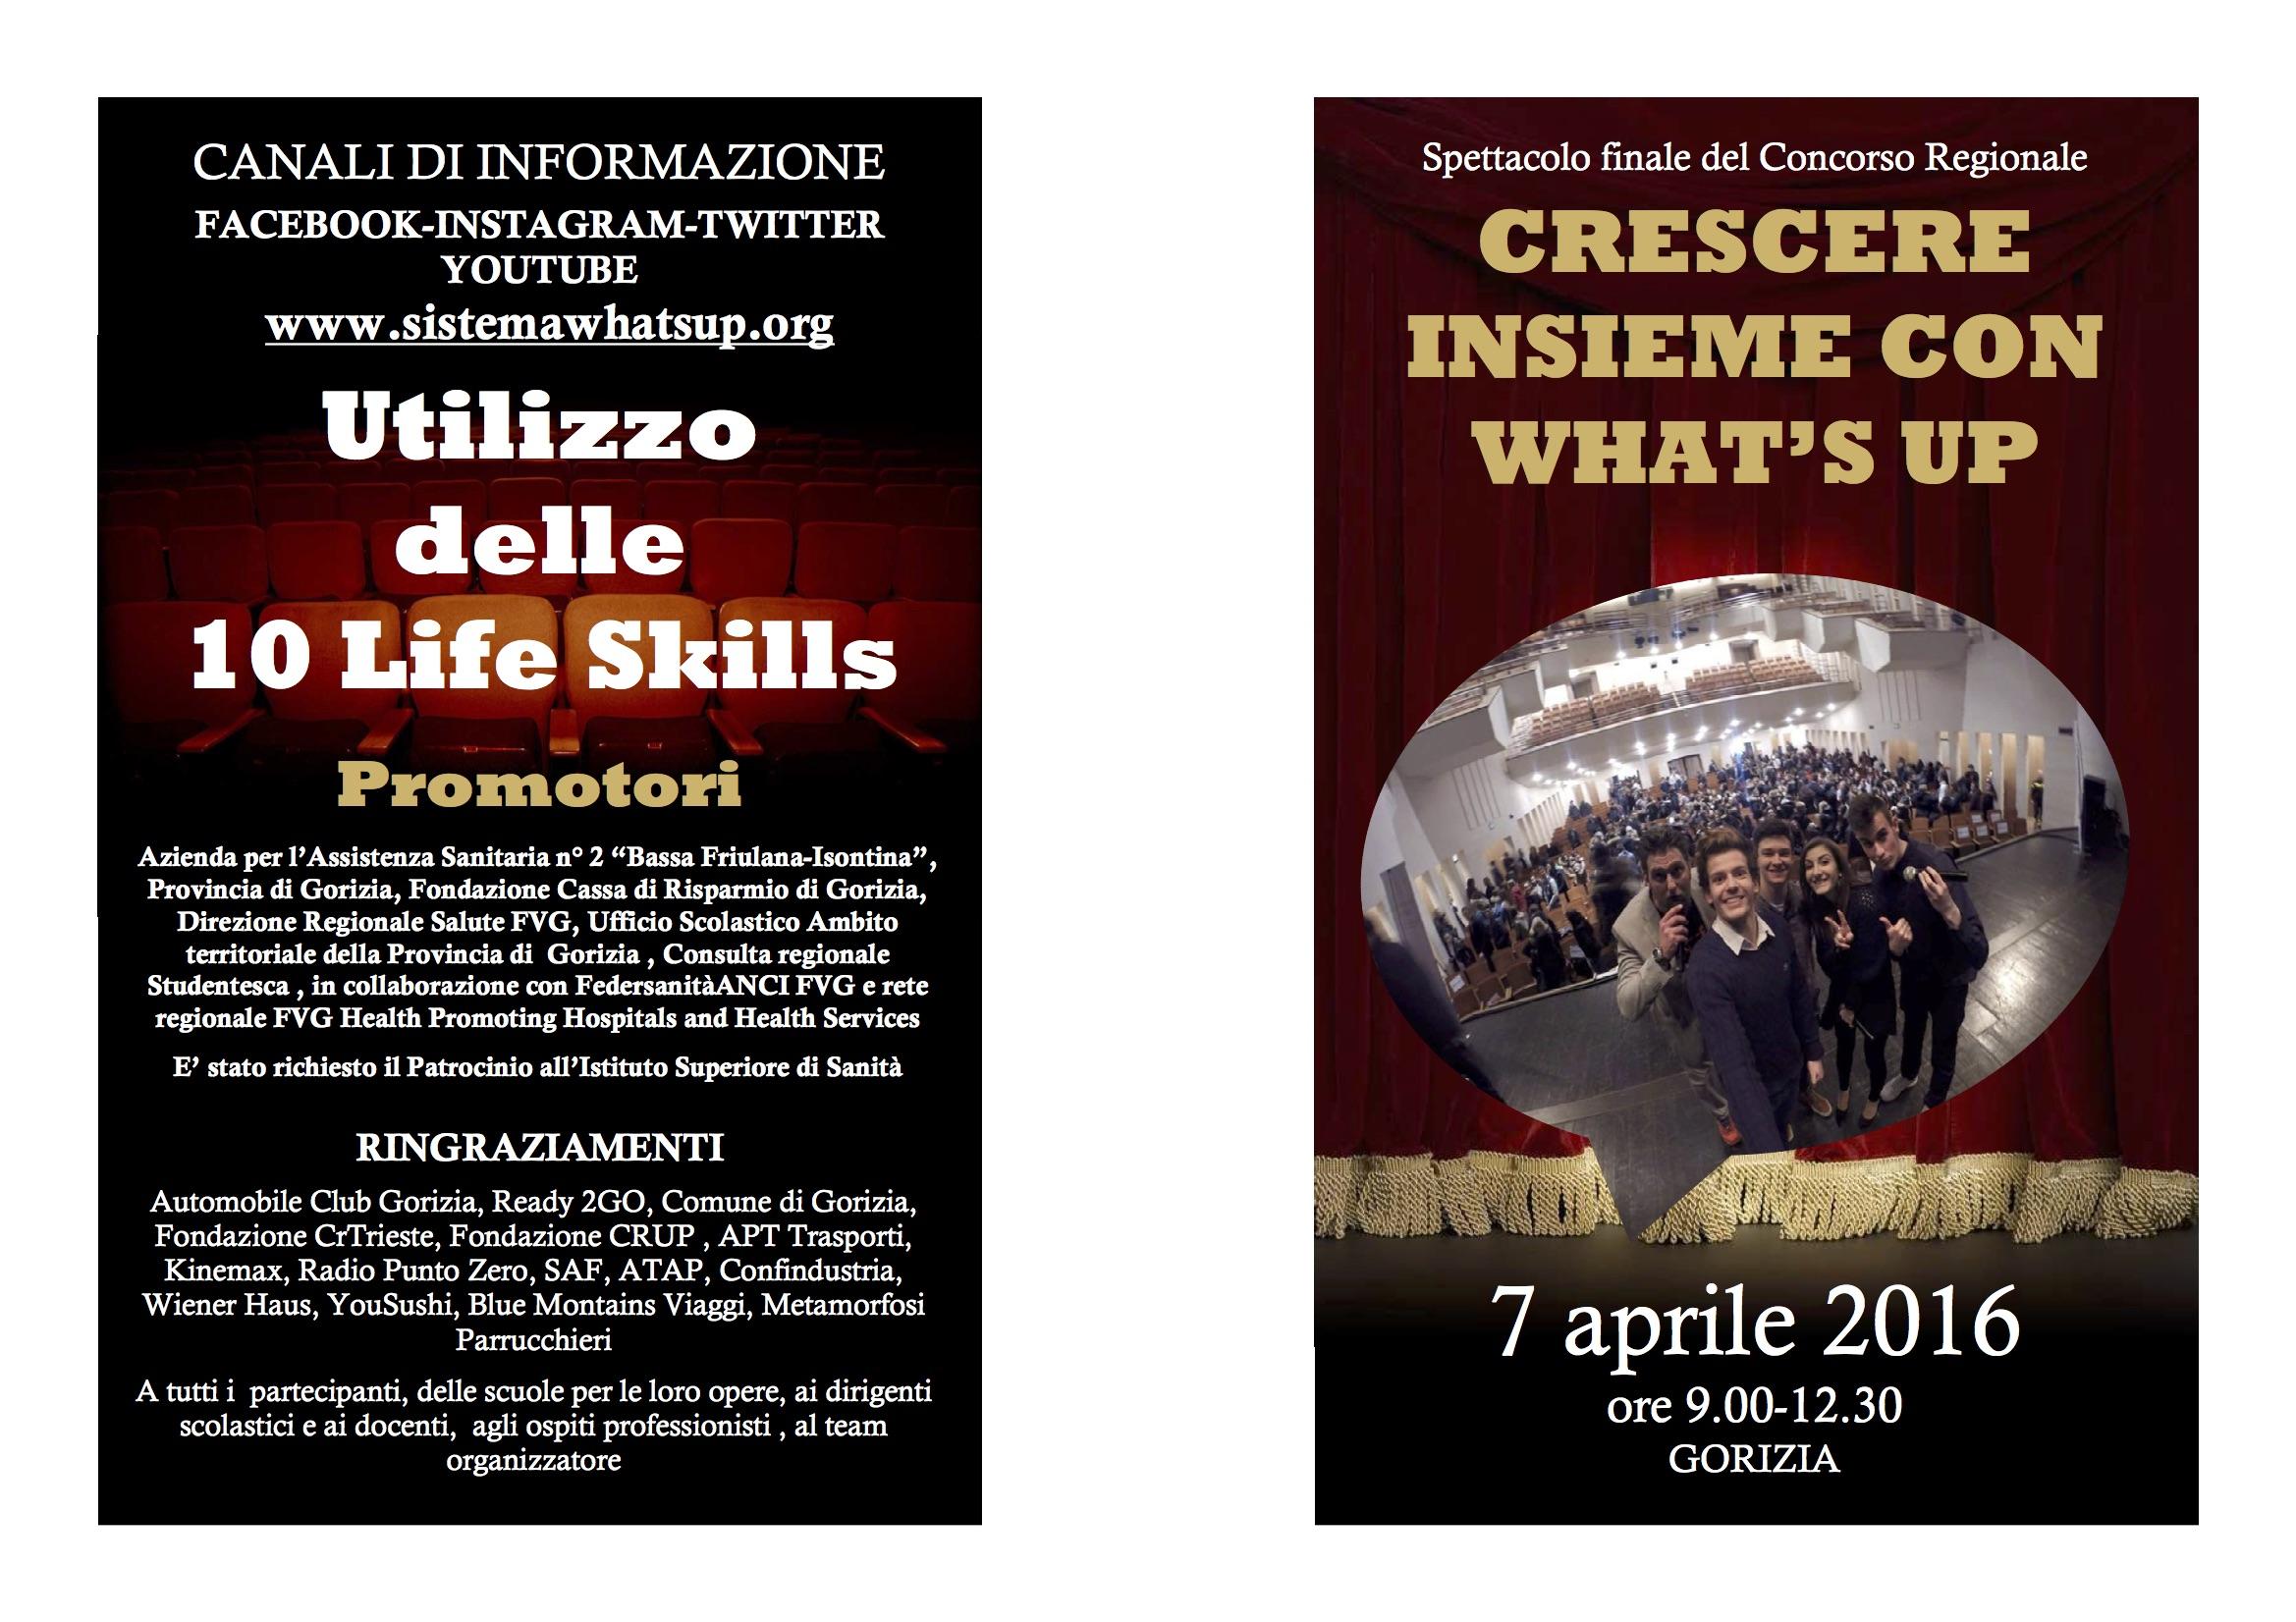 EVENTO def 7 aprile con sponsor